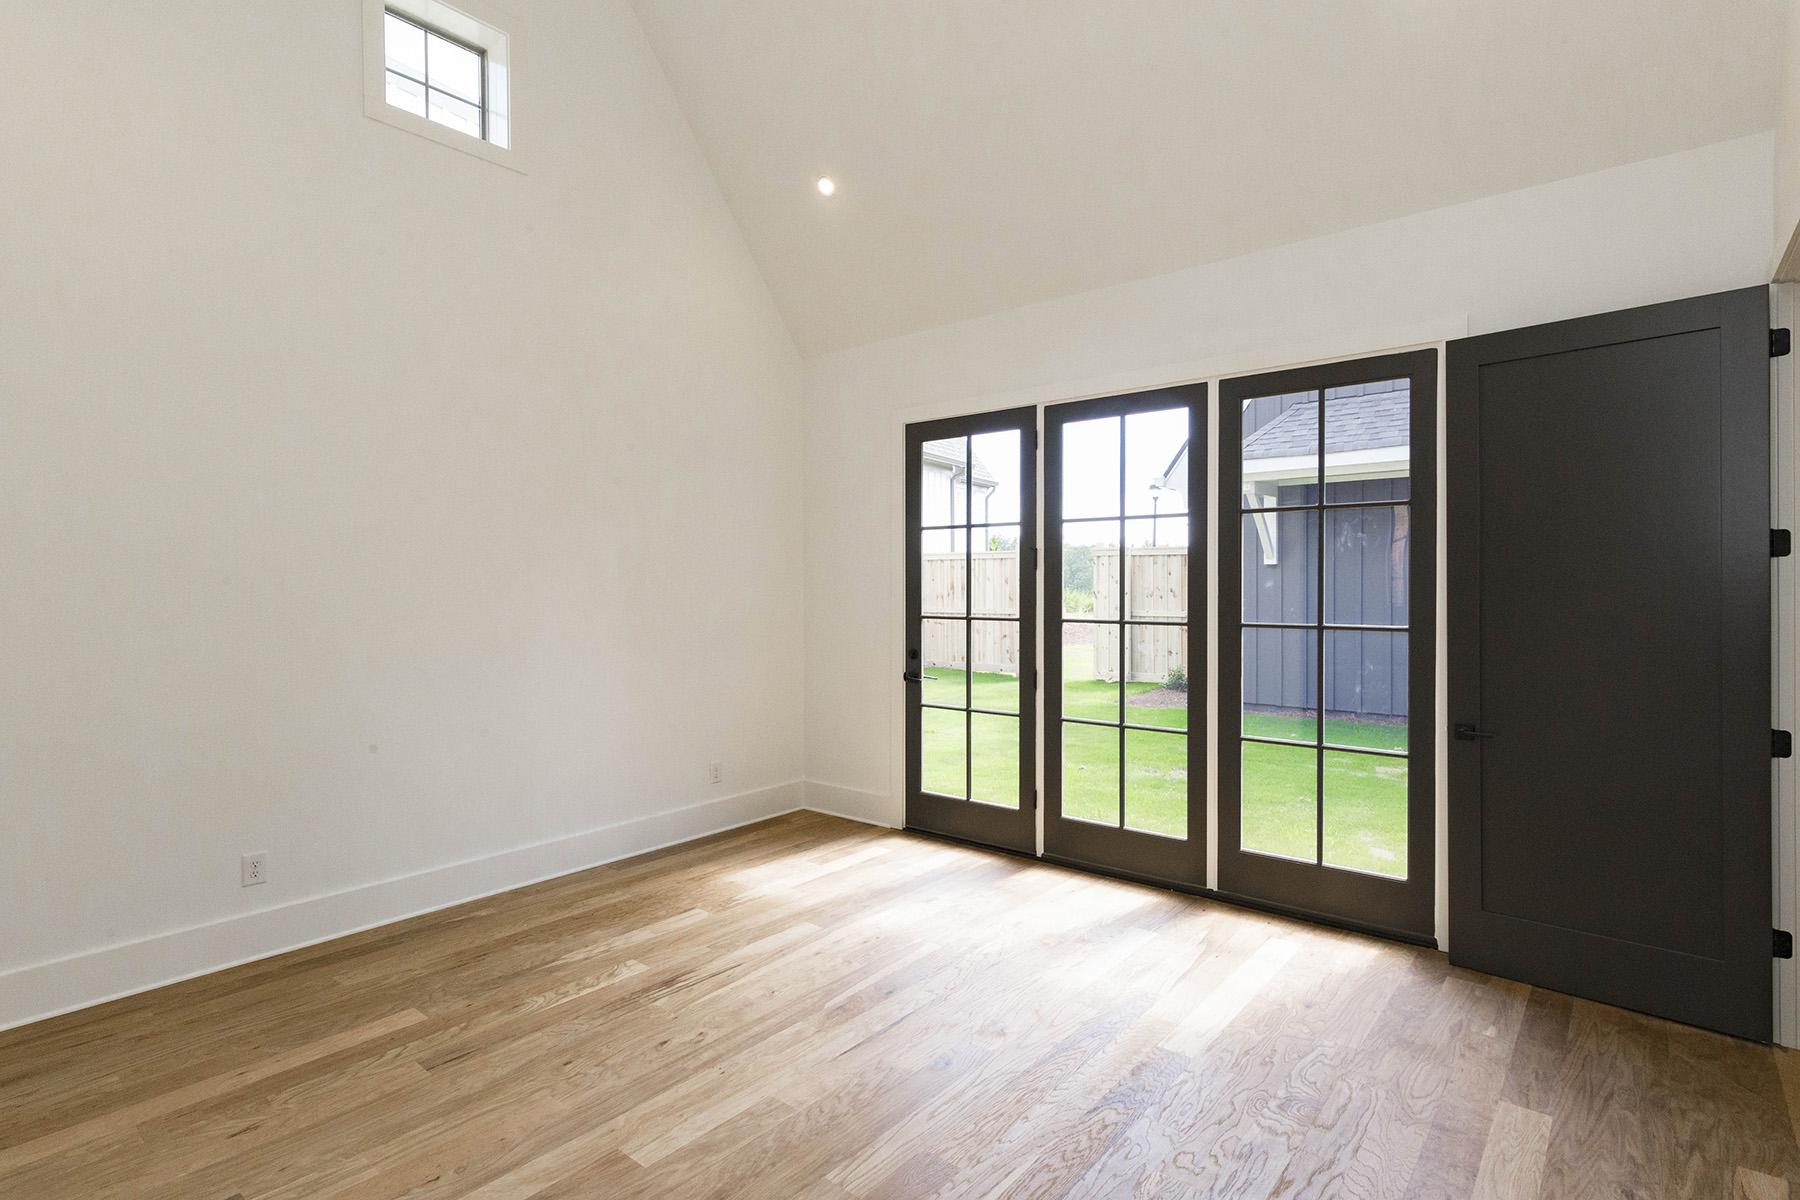 Additional photo for property listing at New Construction Courtyard Home in Newnan- Foxglove Plan 45 Arbor Garden Circle, Newnan, Georgië 30265 Verenigde Staten